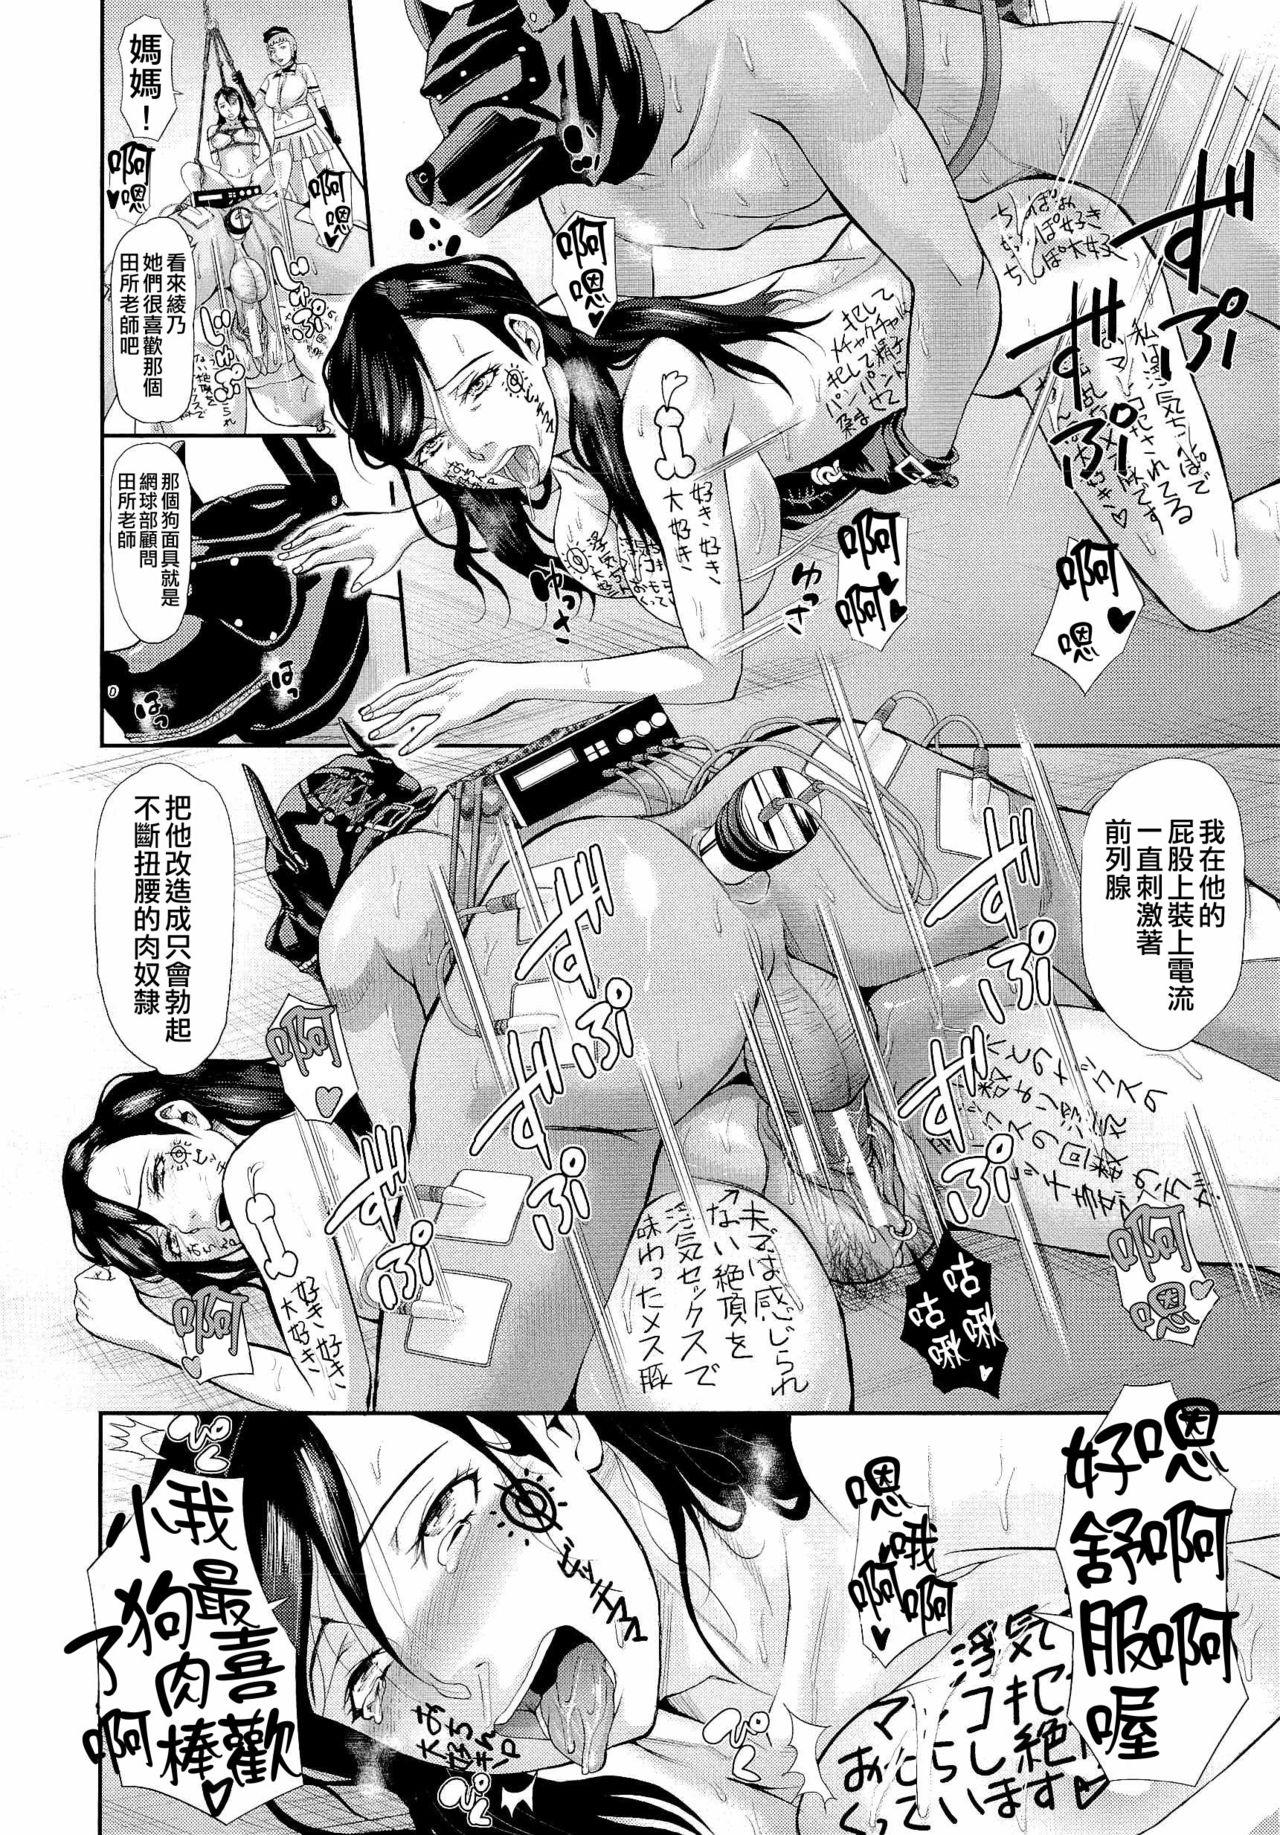 [Honebuto Danshaku] Innou Kaizou Program ~Oyako Zecchou Cult Ochi~ [Chinese]【不想记名重嵌--高质量图源】 196